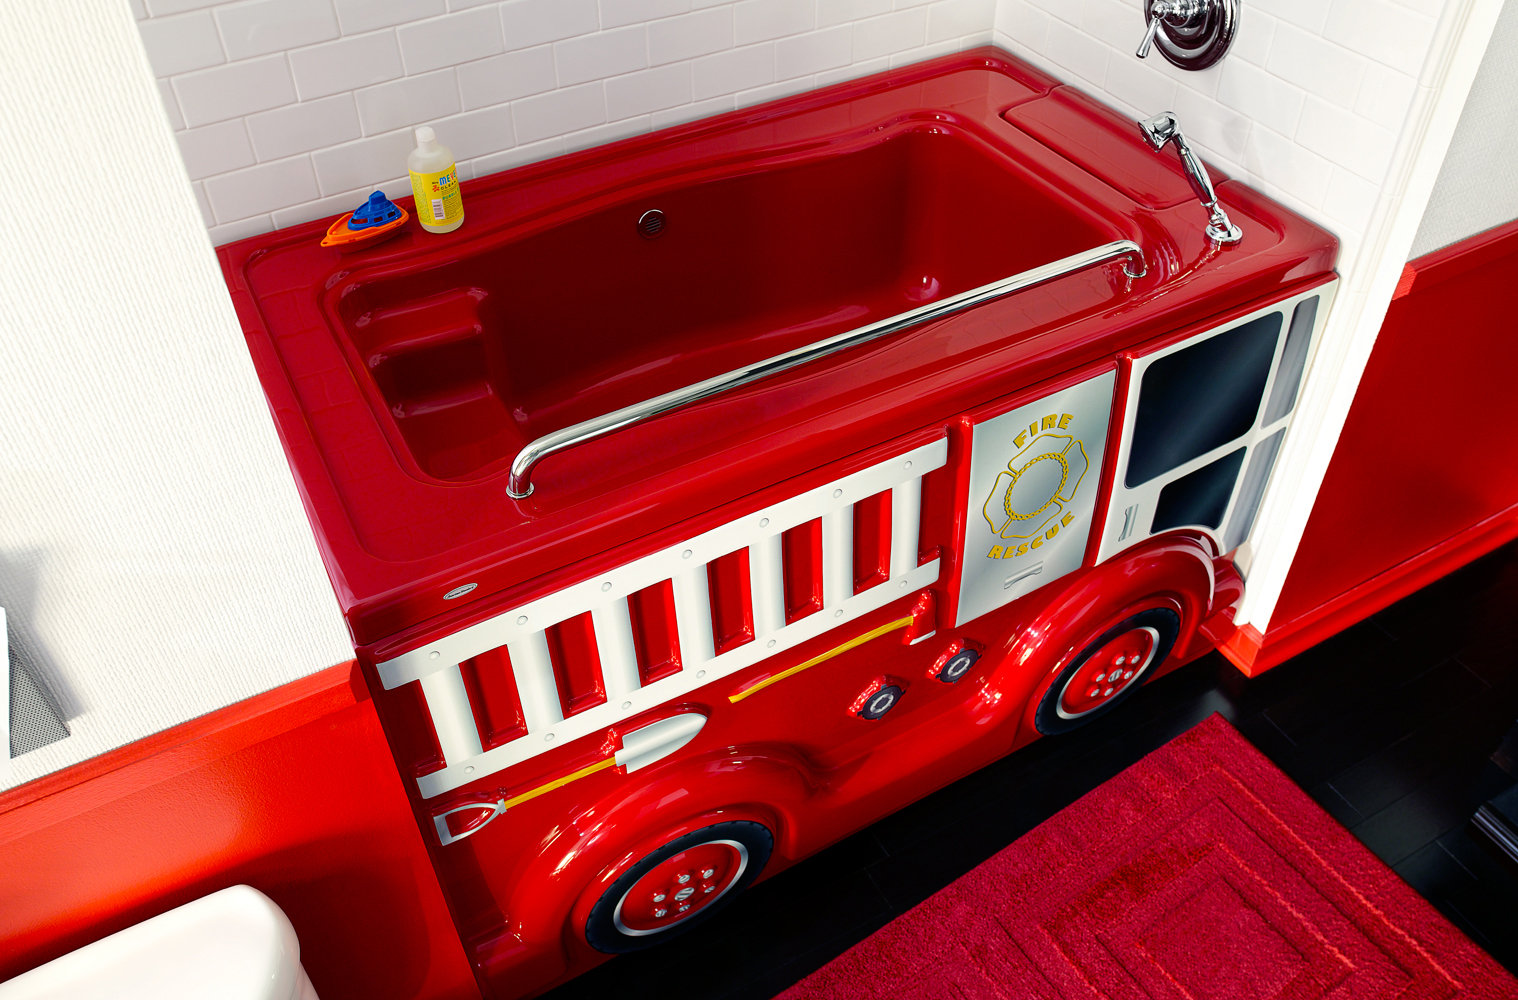 American Standard KT.001.024 Fierce Fire Truck Design